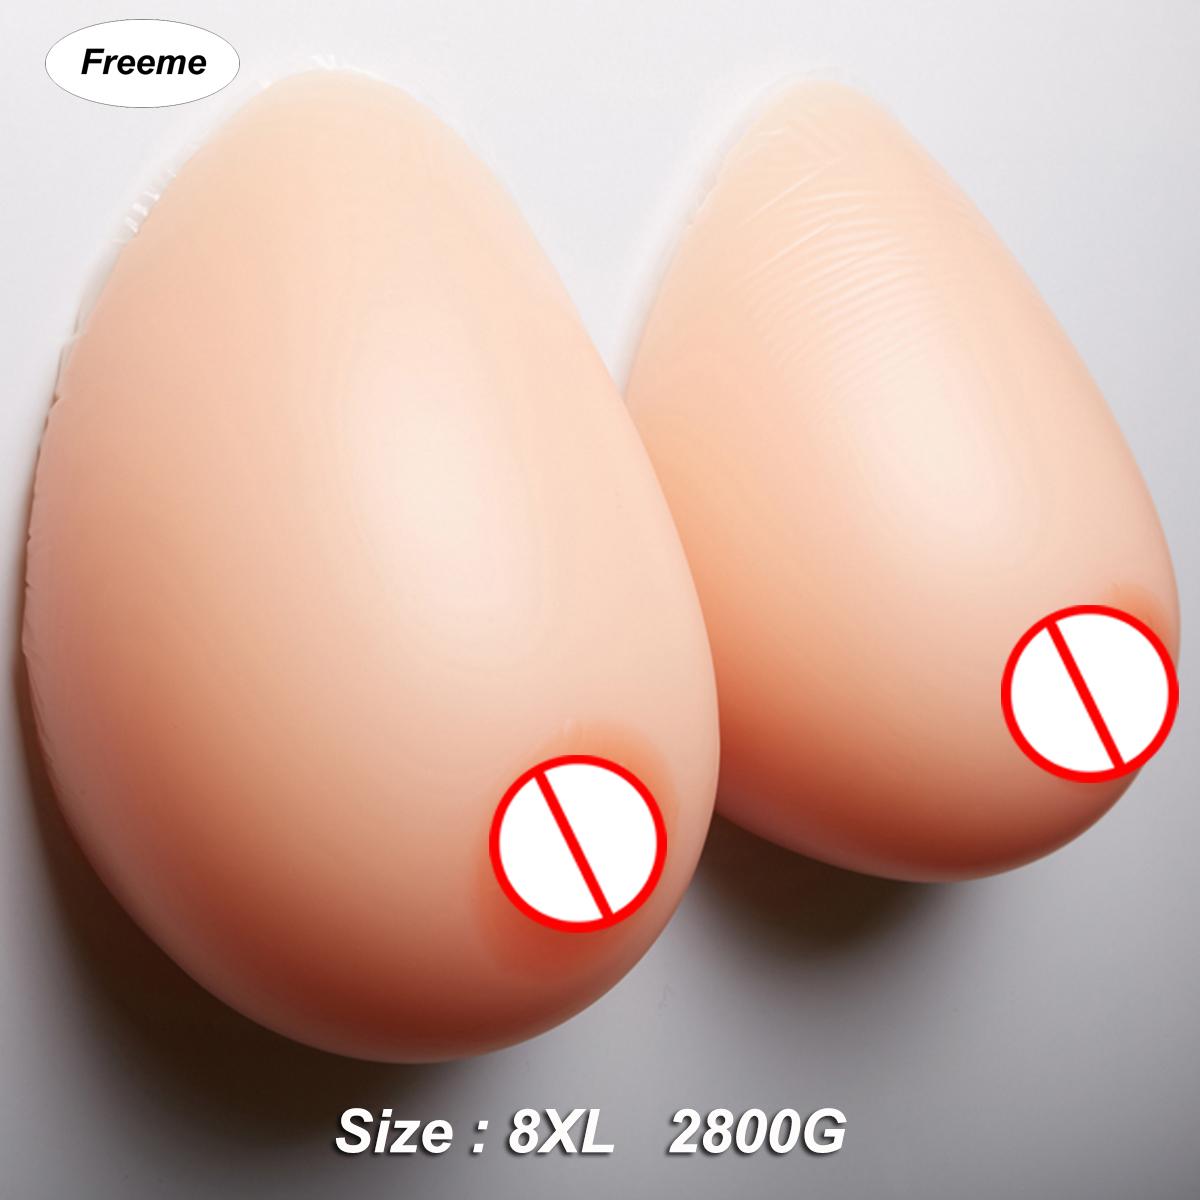 Jiyaru Silicone Breast Forms Prosthesis Boobs for Mastectomy Crossdresser 1 Pair Skin 9XL 3200g